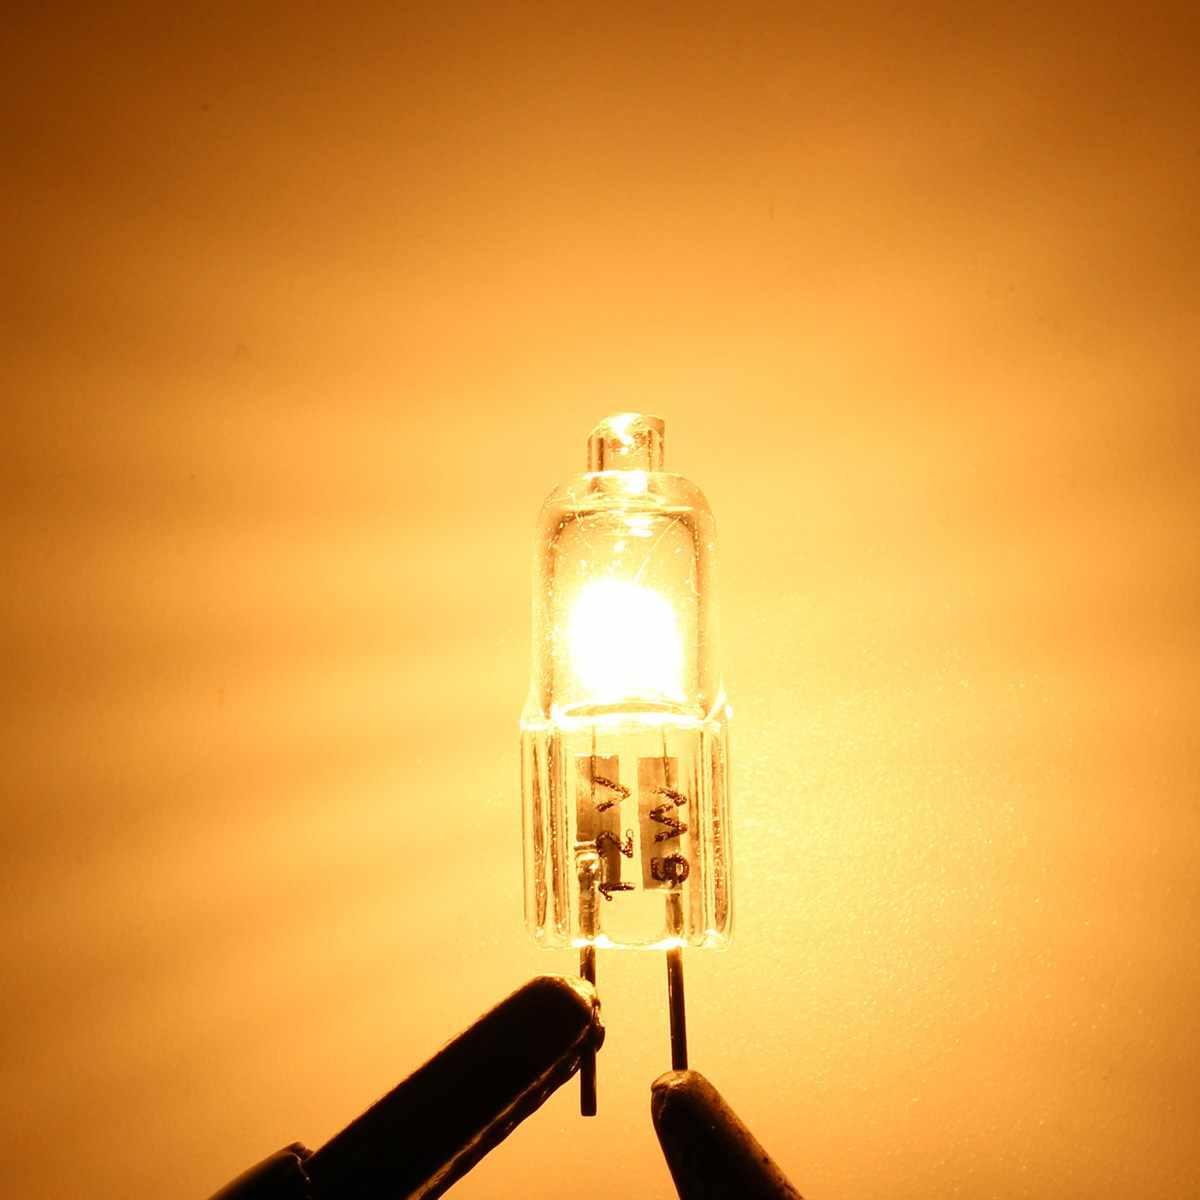 Smuxi 1/10 Pcs 5 W 35 W 50 W Hemat Energi Bola Lampu Tungsten Halogen Lampu DC 12 V G4 Basis Batal Lampu Dua Pin